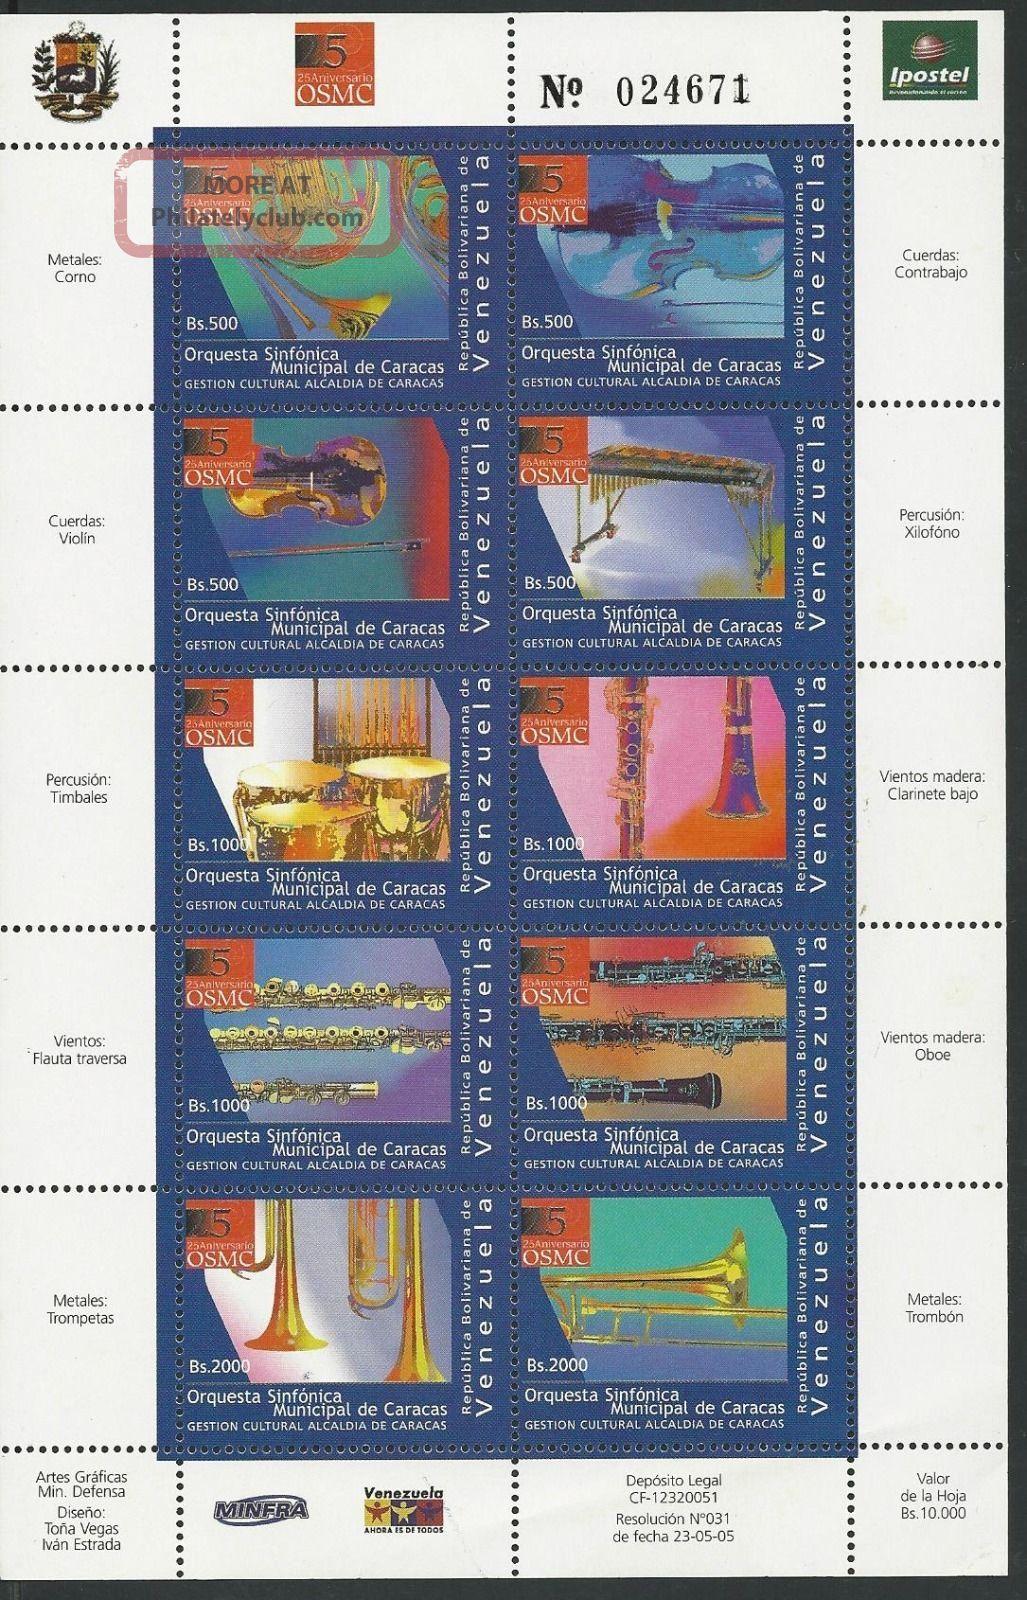 Venezuela 2005 Music Orchestra Instruments - Sheet 10 Latin America photo